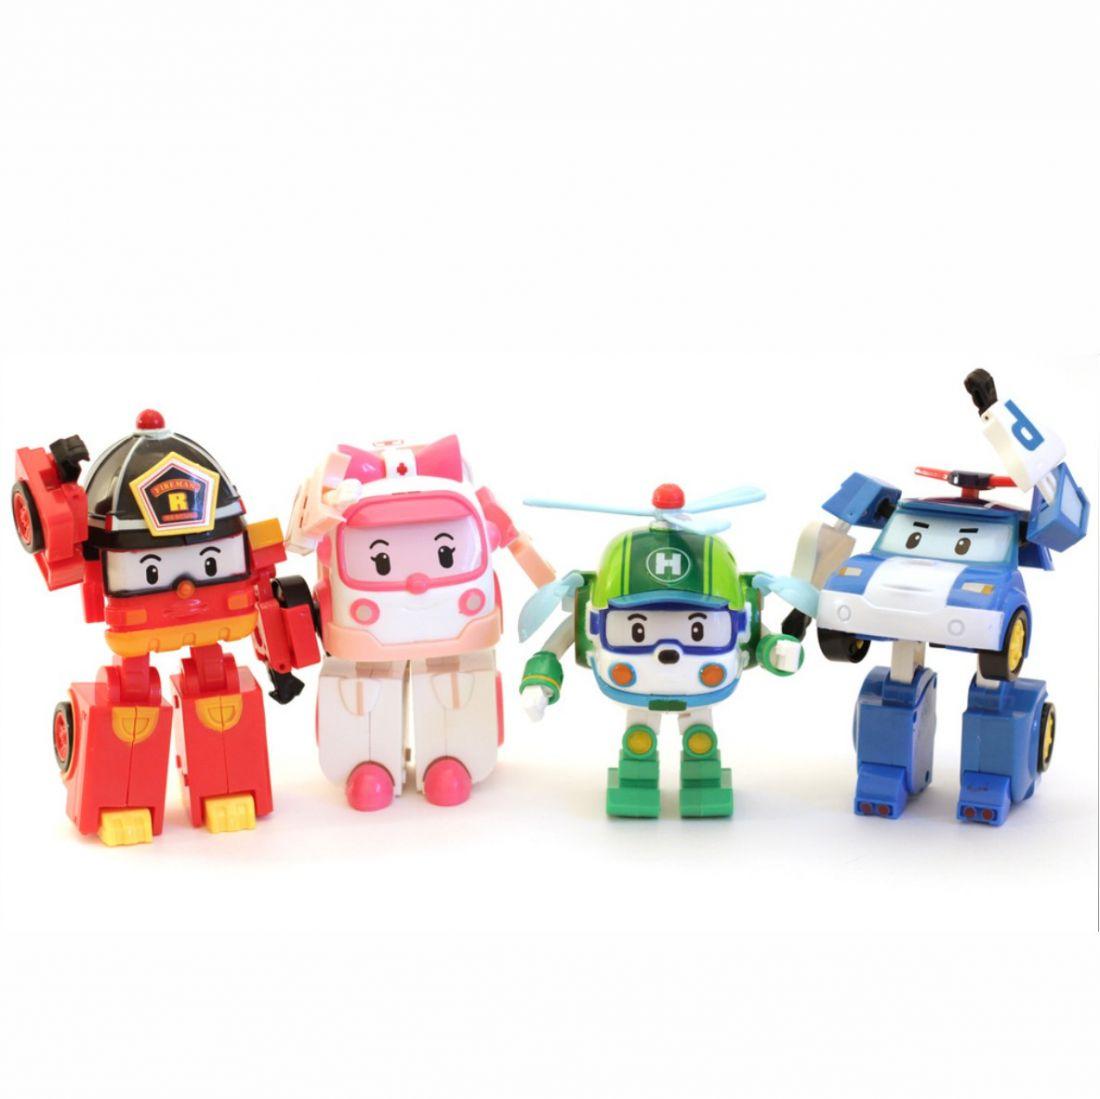 Поли робокар 6 персонажей мультфильма